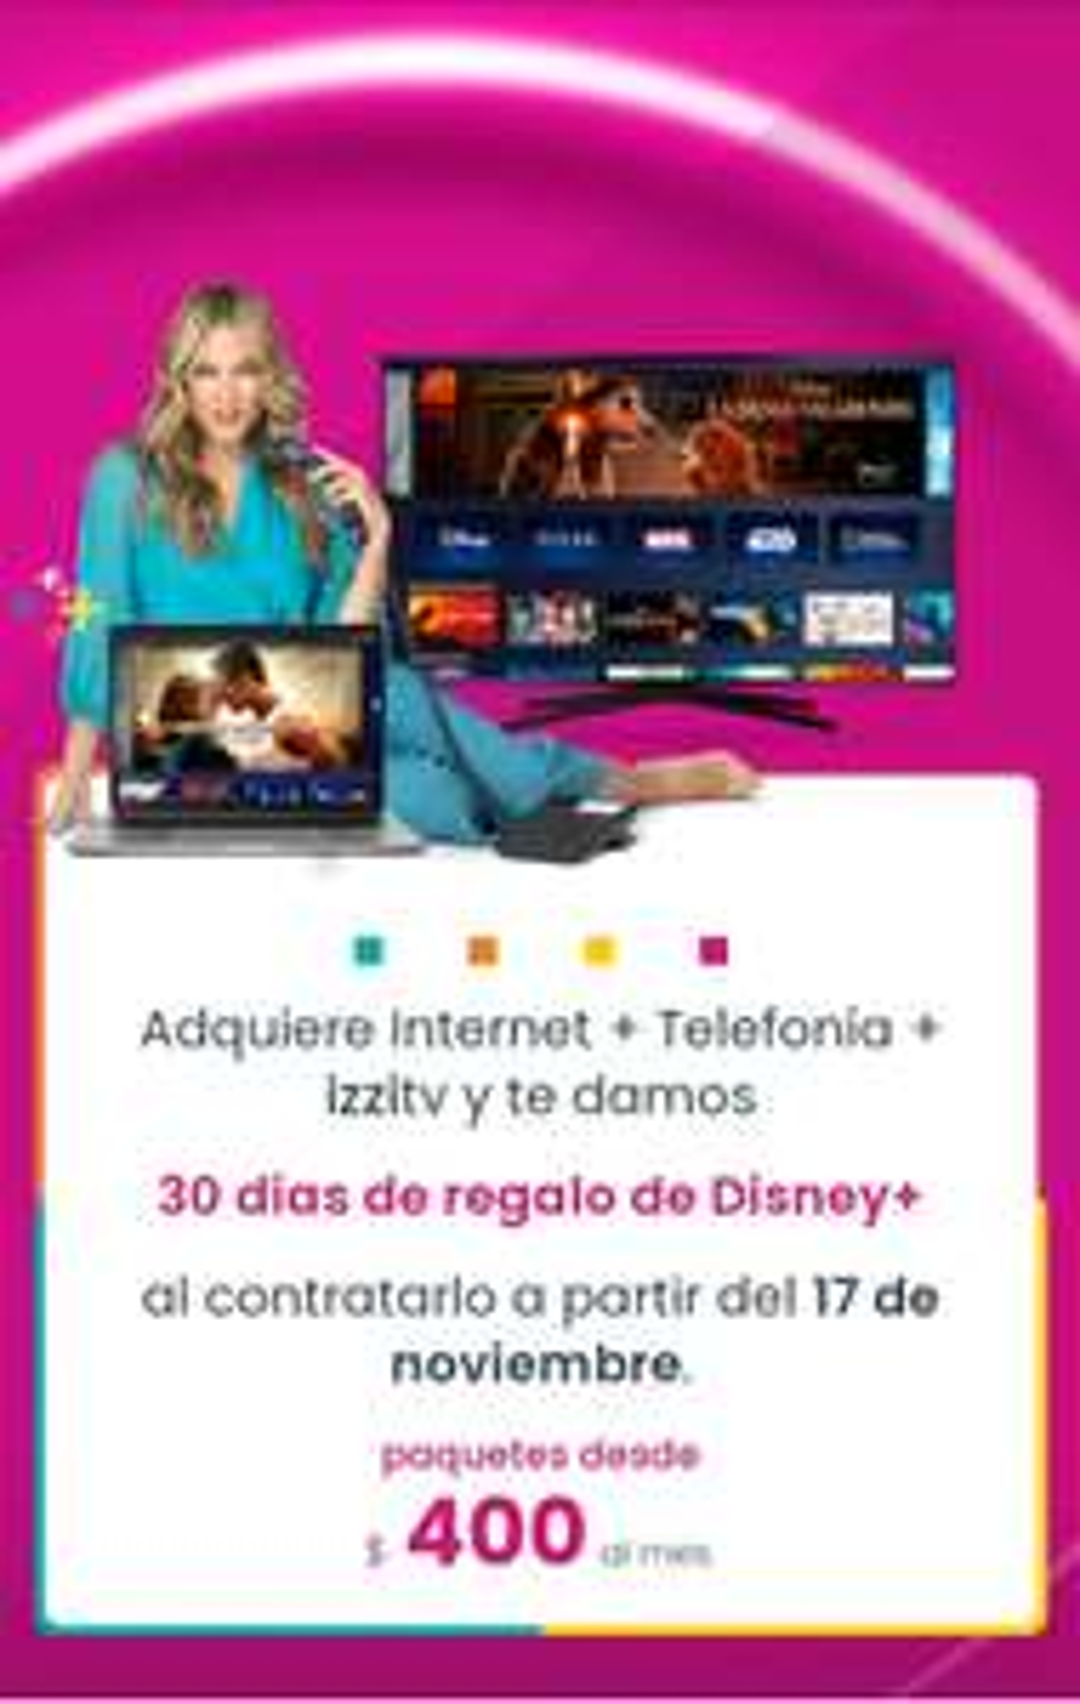 Izzi: 30 dias de Disney+ gratis al contratar cable+teléfono+intetnet